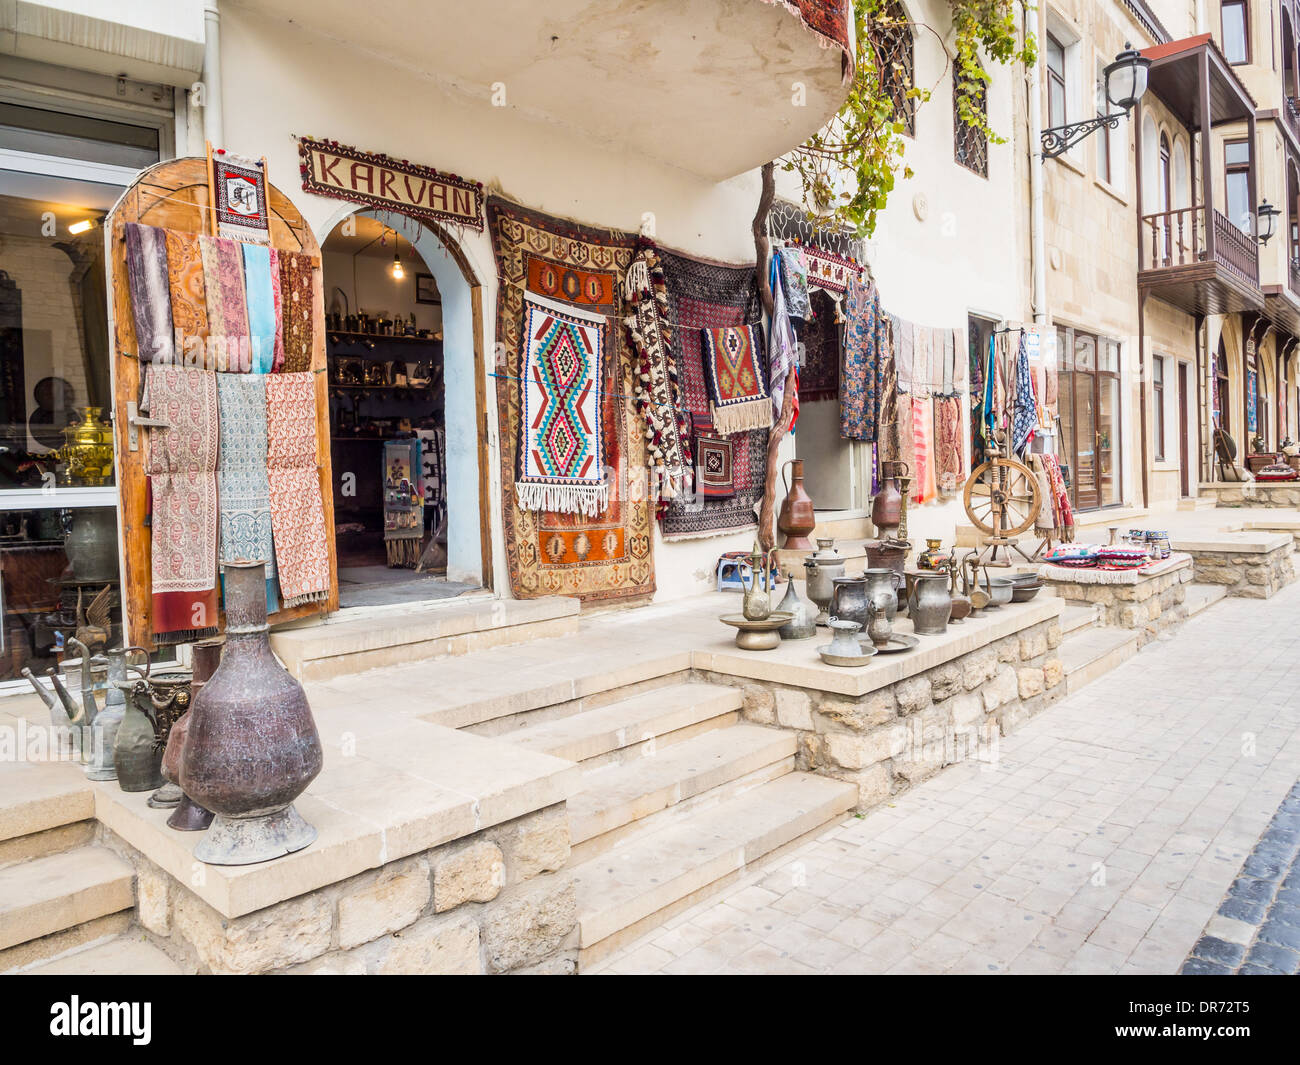 The Old Town (Icheri Sheher) Old Town of Baku, Azerbaijan. - Stock Image